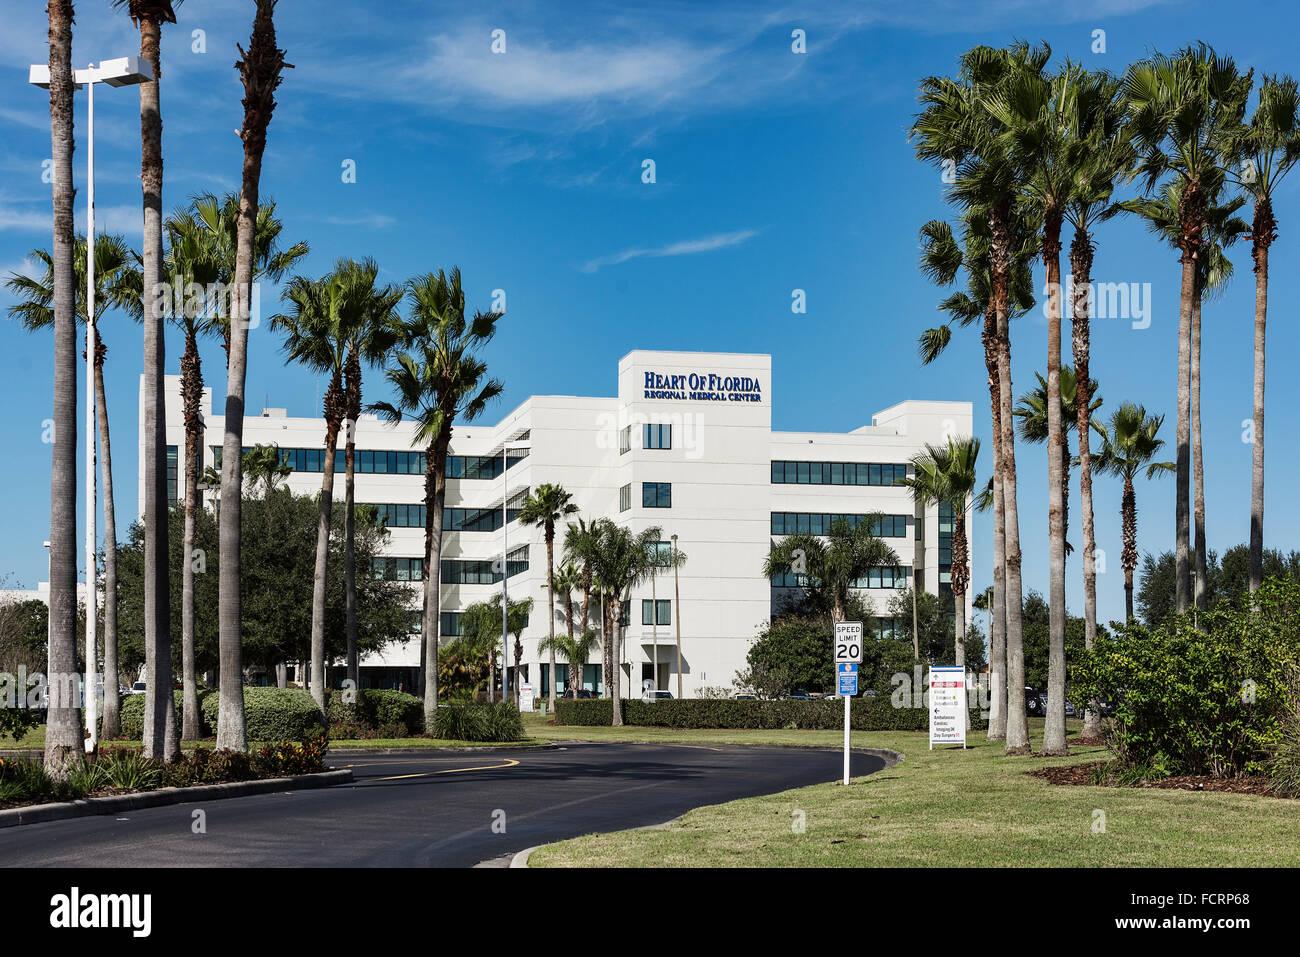 Heart of Florida Regional Medical Center, Davenport, Florida, USA - Stock Image